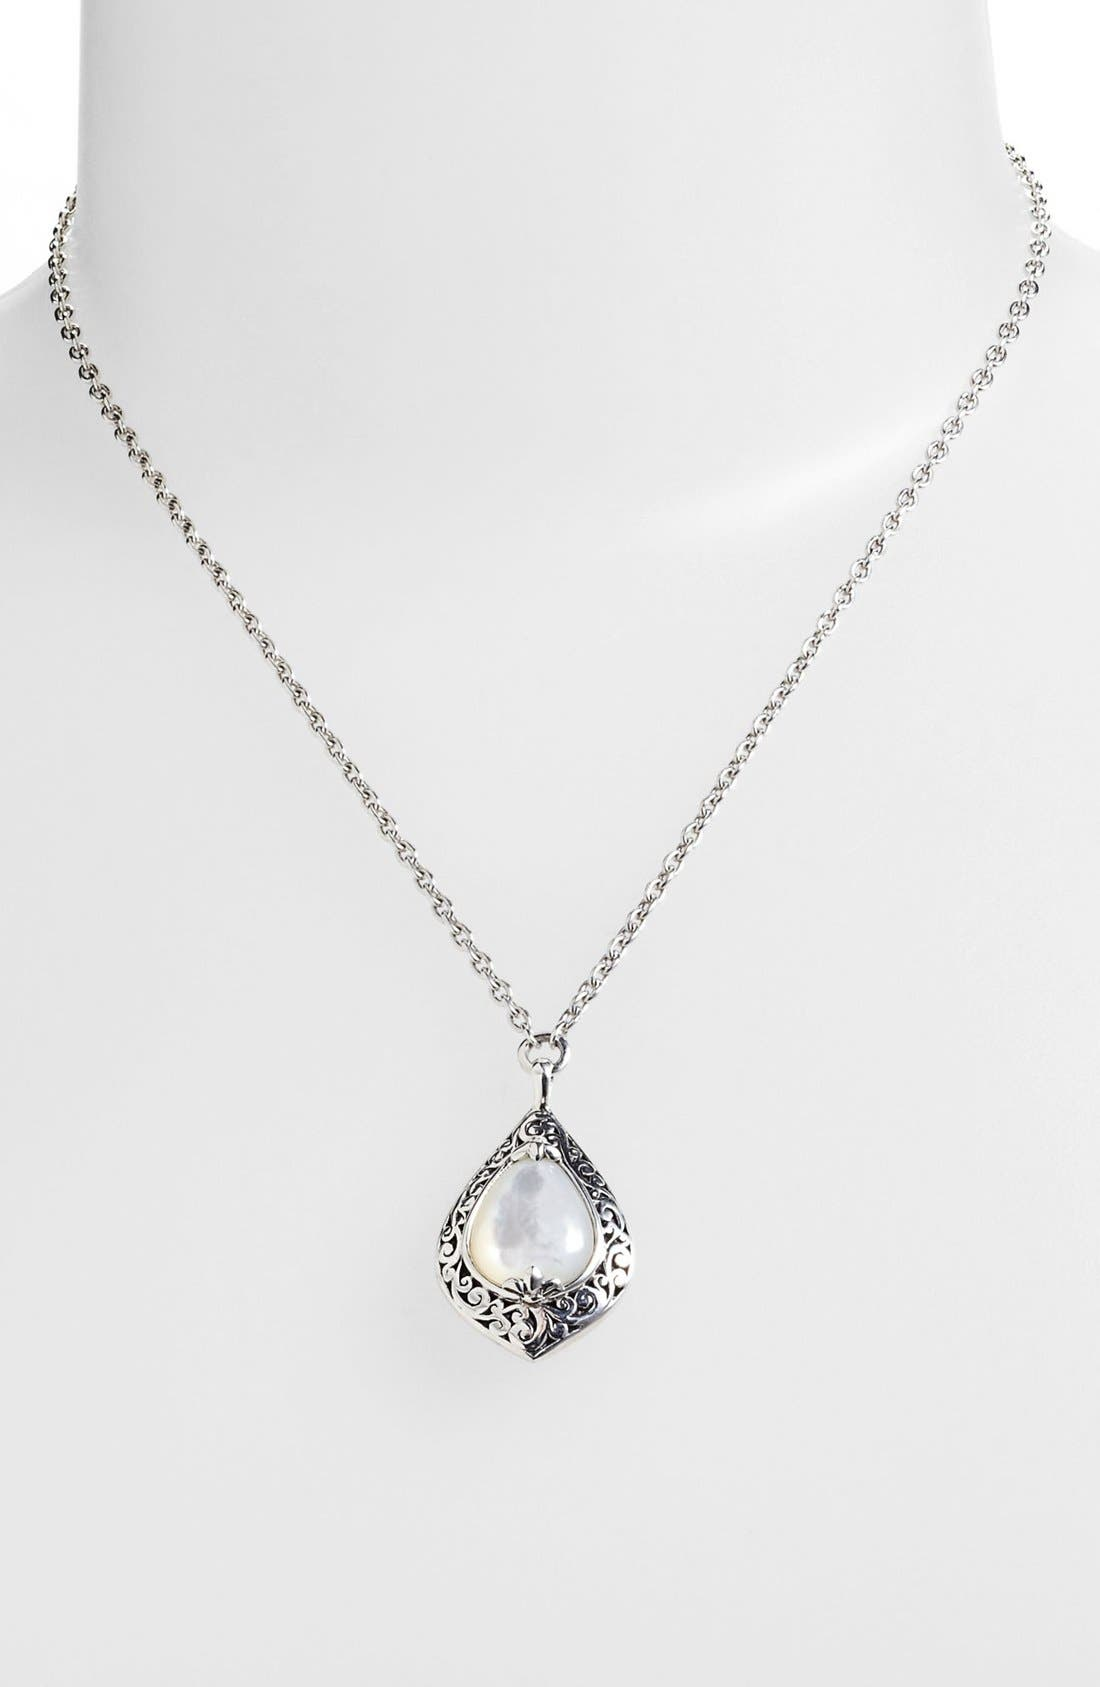 Main Image - Lois Hill Medium Mother-of-Pearl Teardrop Pendant Necklace